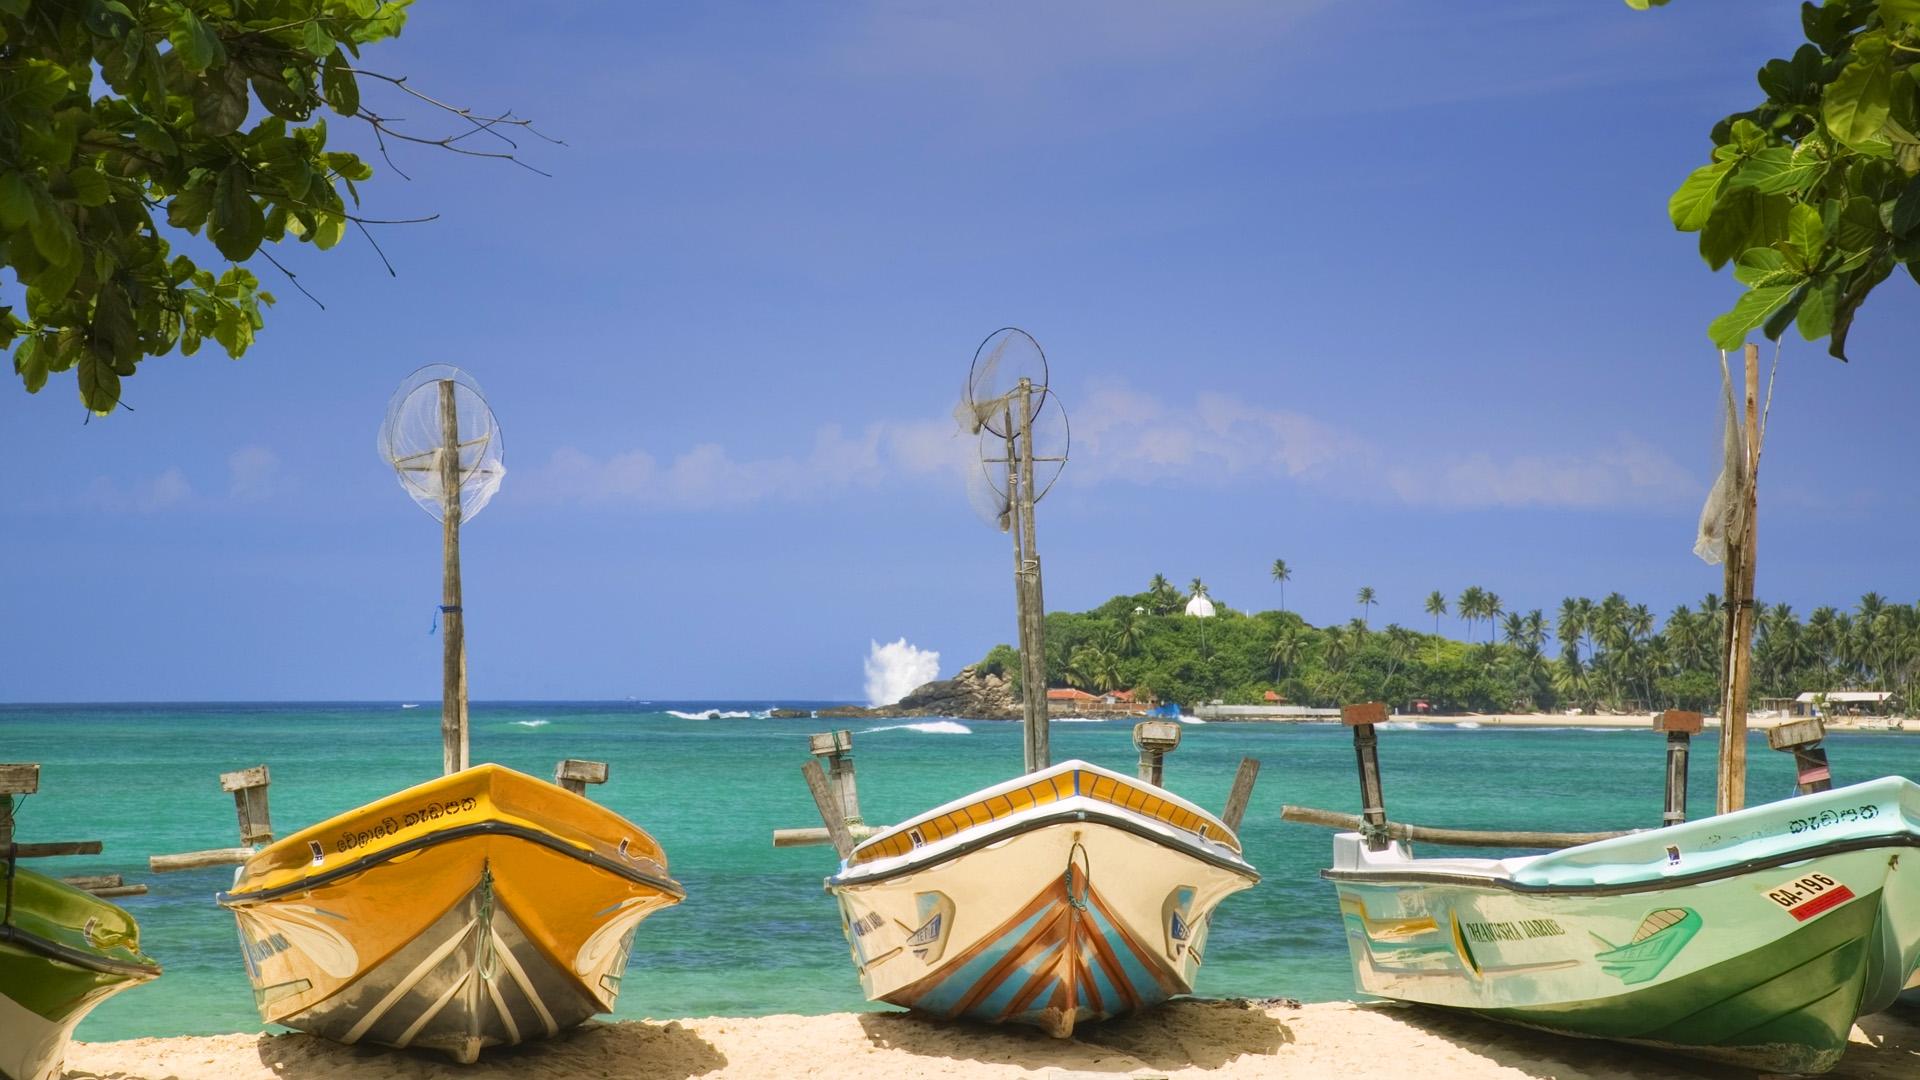 Sri Lanka Beach Tour 2